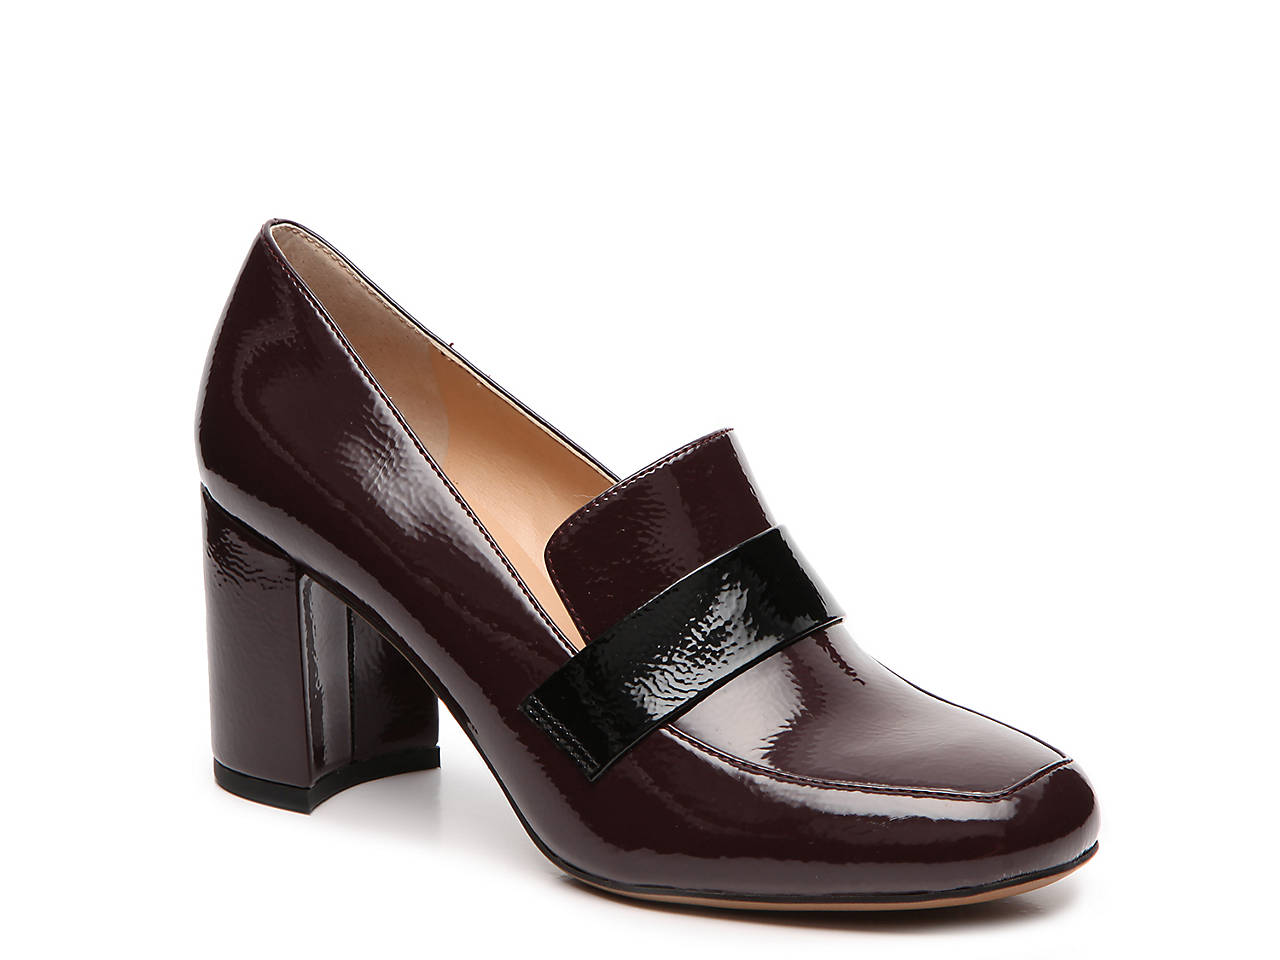 eb7c329a58f Franco Sarto Karter Pump Women s Shoes